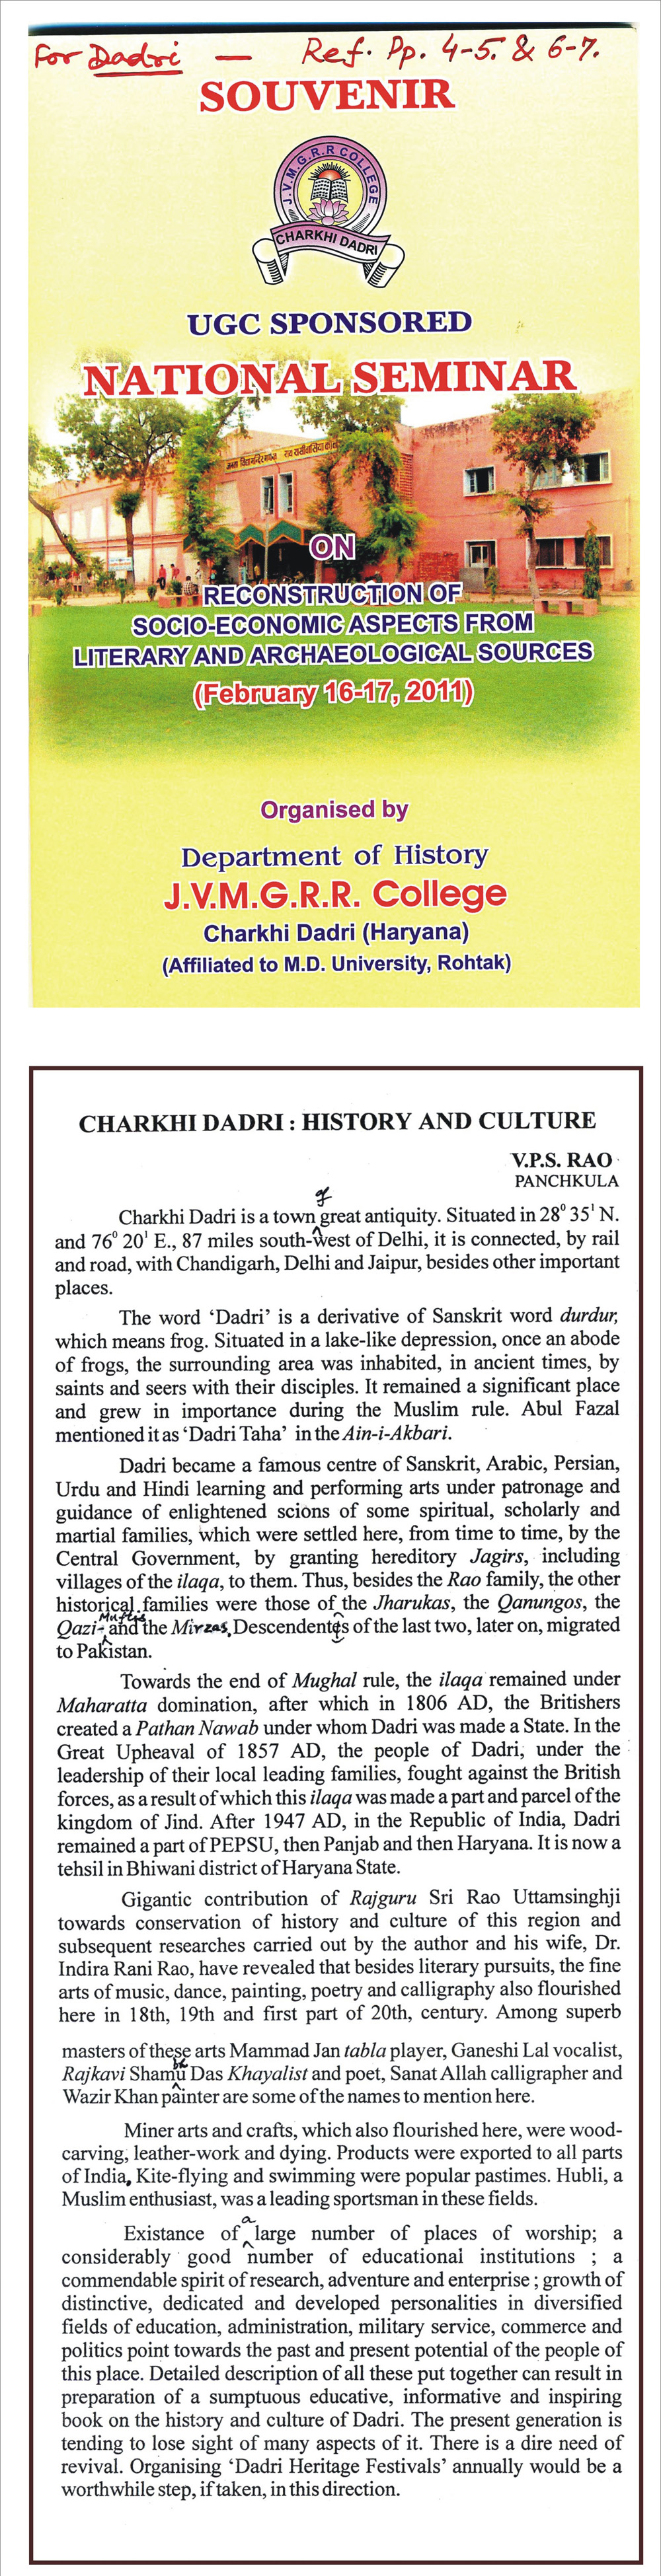 Charkhi Dadri History & Culture by Sri VPS Raoa